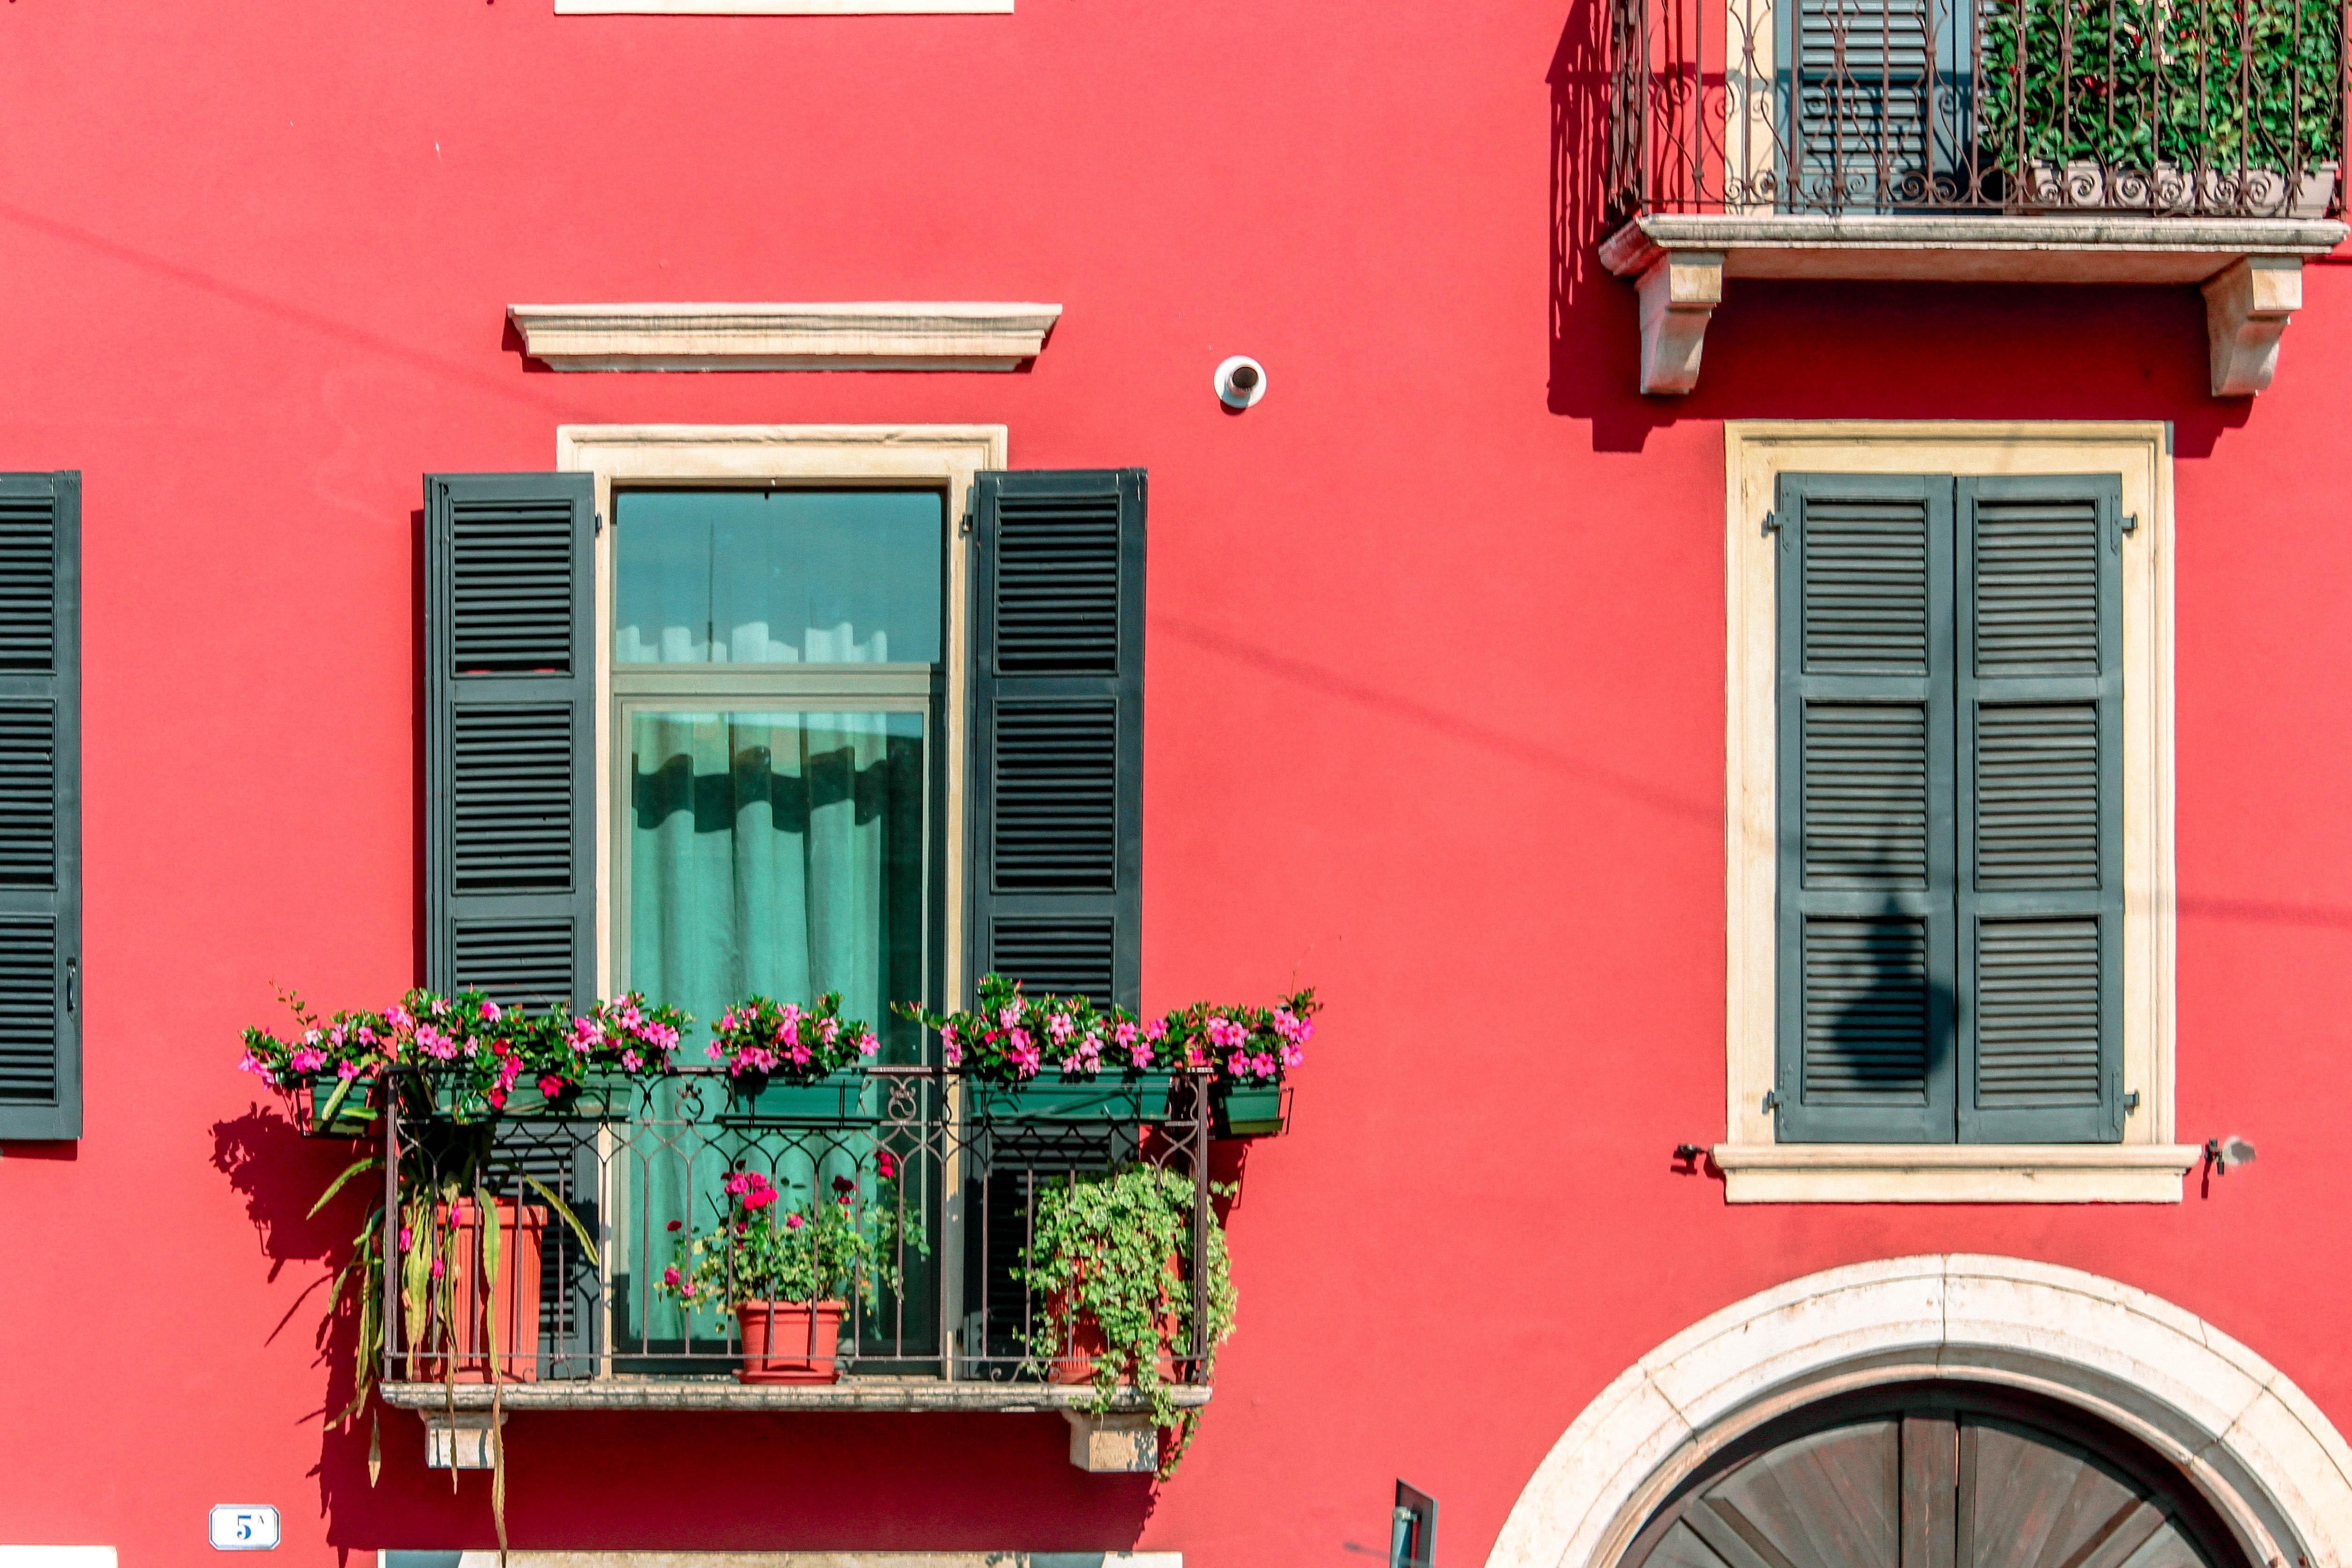 As varandas podem ser convertidas num jardim / Photo by nrd on Unsplash